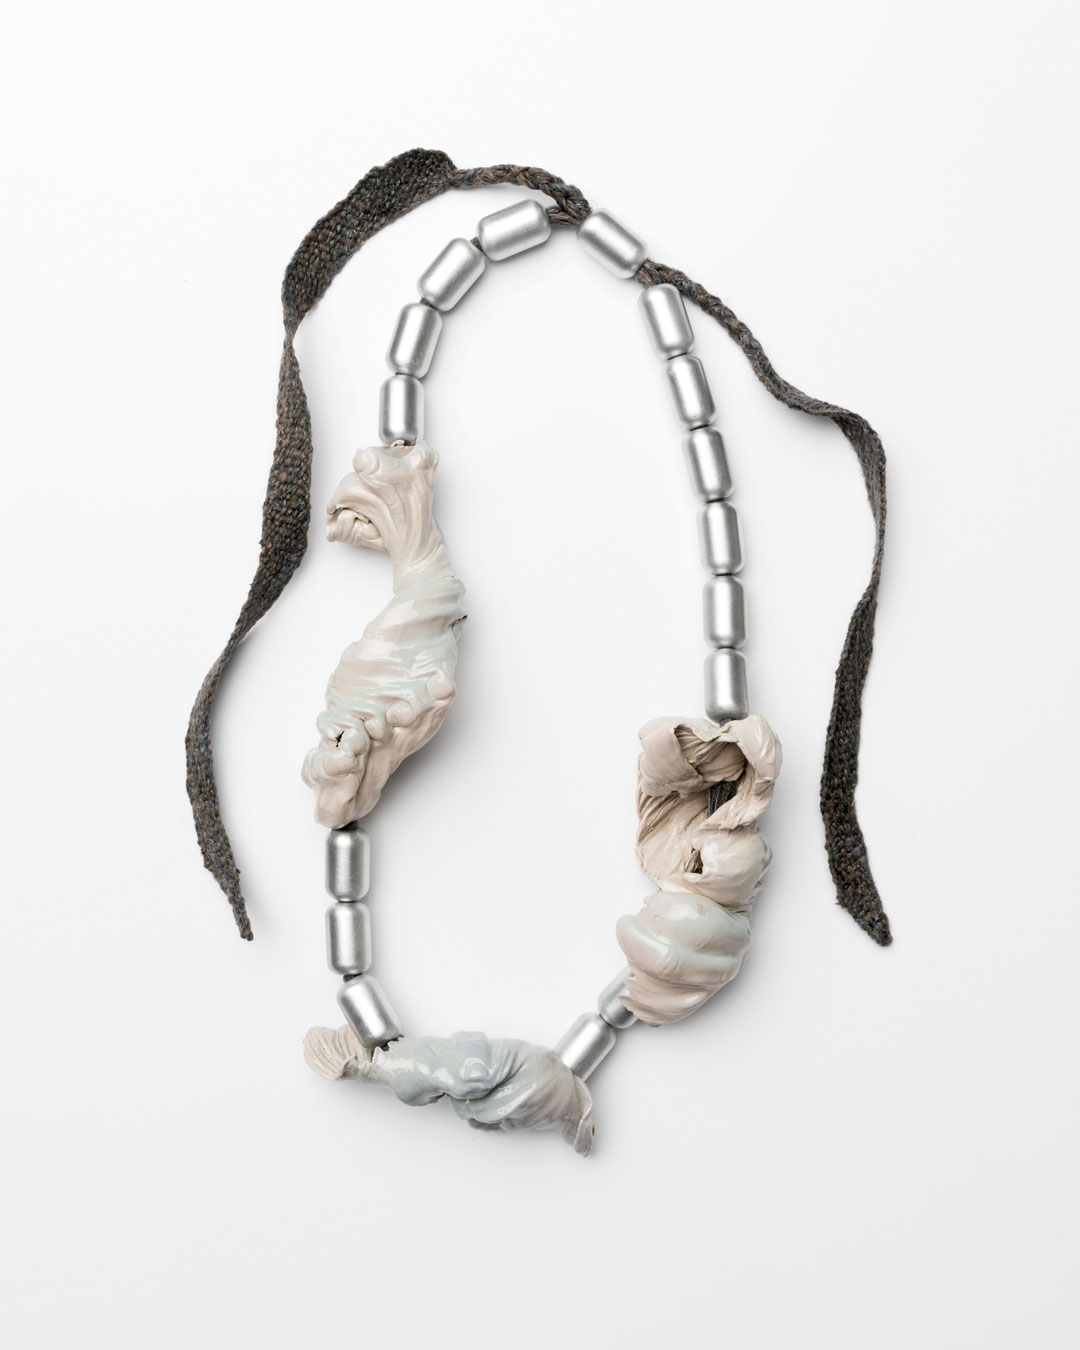 Ineke Heerkens, Cold Gravity, 2017, necklace; linen, wool, viscose, silk, aluminium, ceramic, glaze, 390 x 180 x 65 mm, €2300